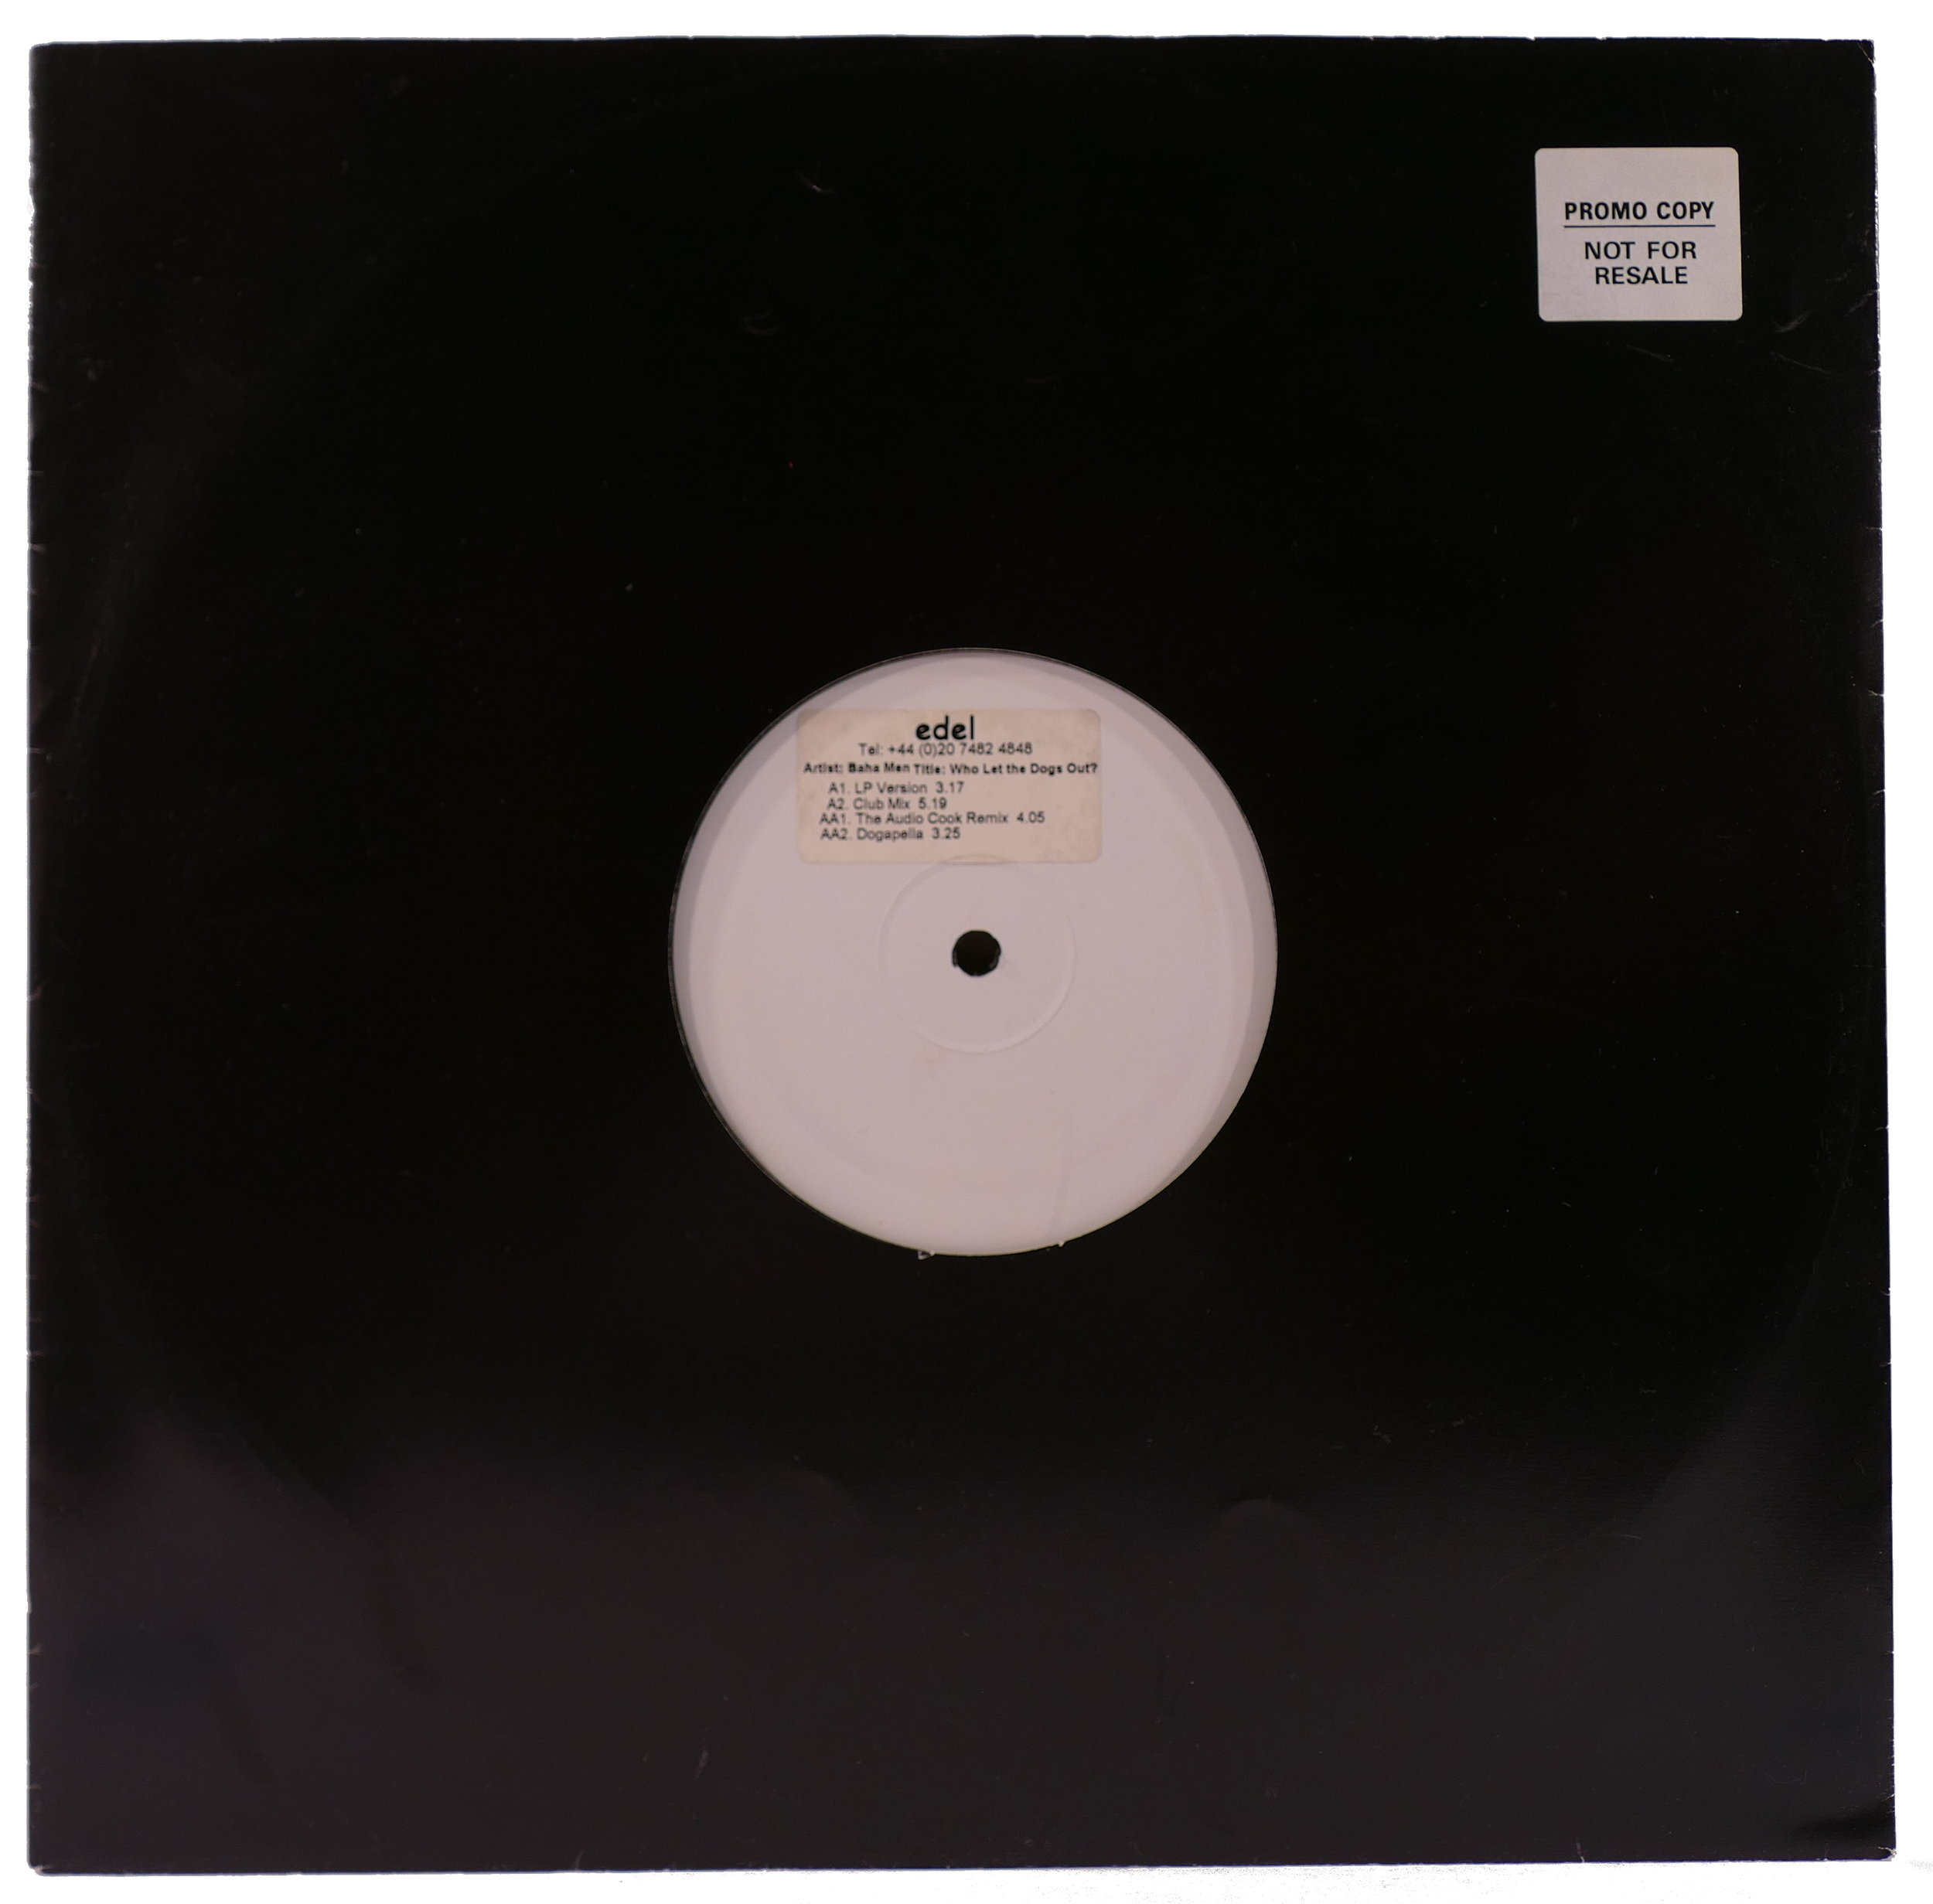 WLWLTDOO-2000-12-BAHA-WLTDO-UK-A.JPG